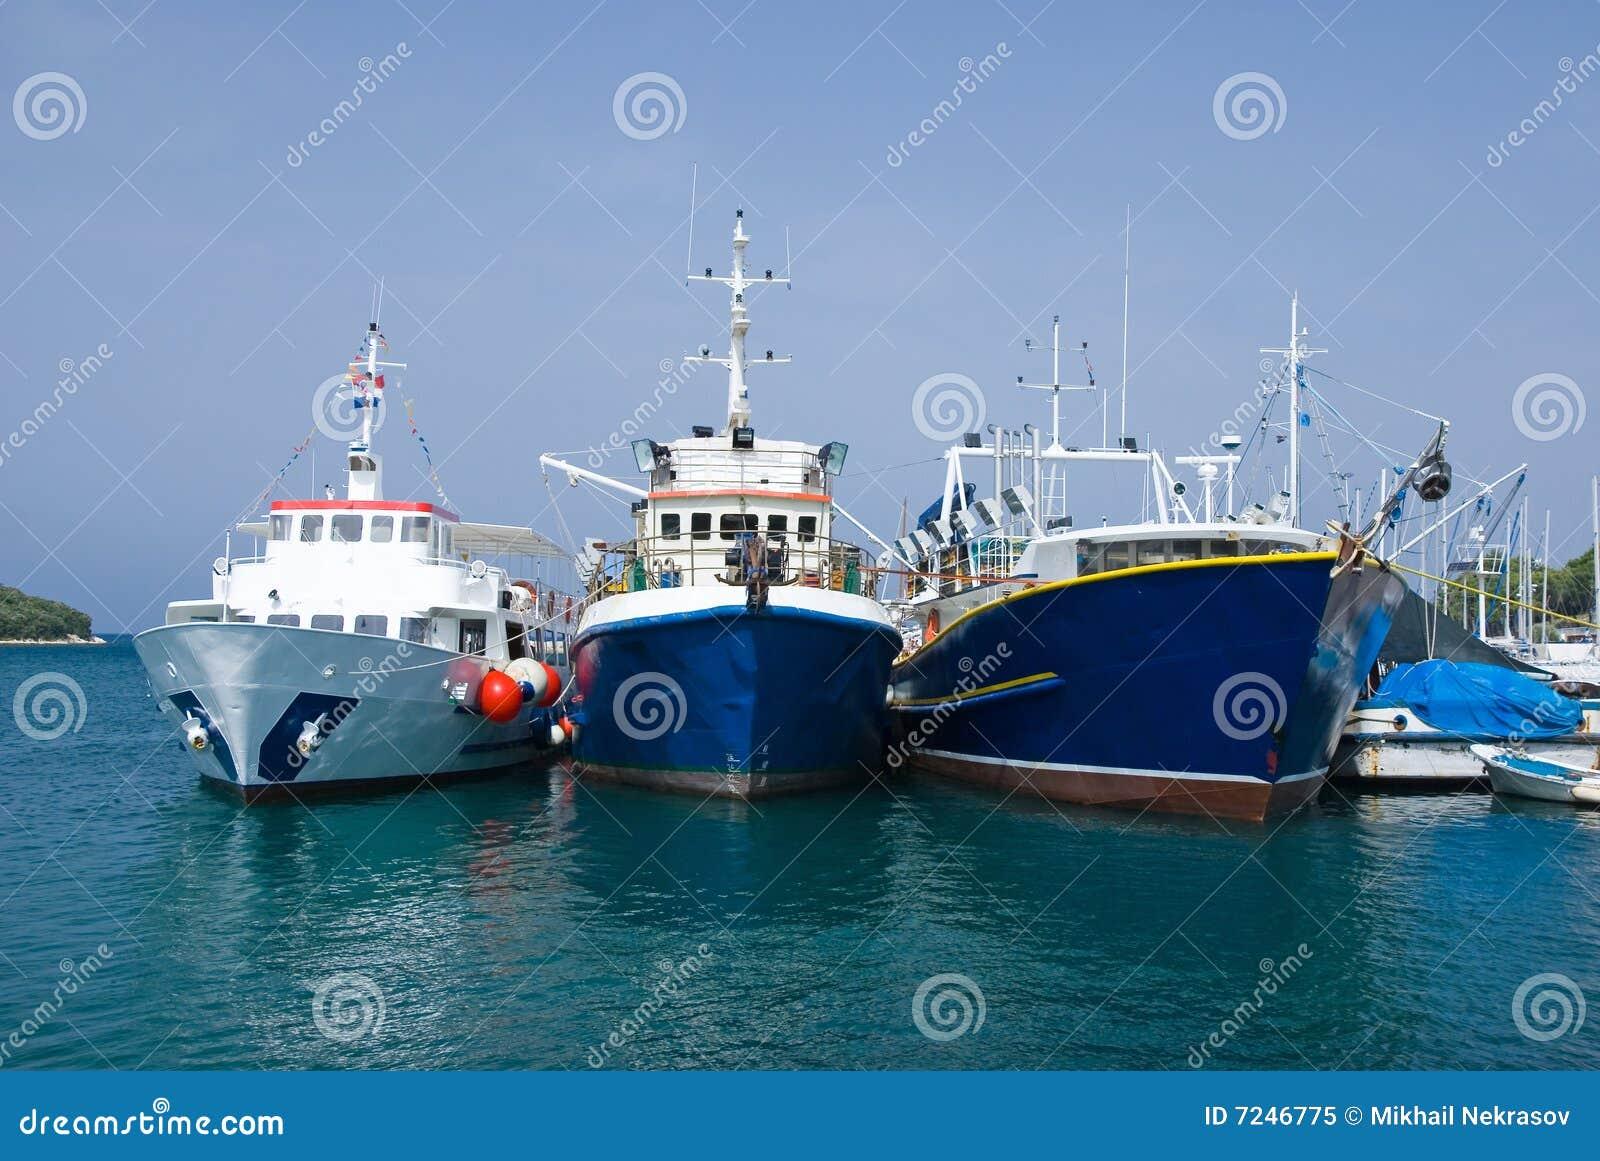 Three fishing boats in the port of Vrsar